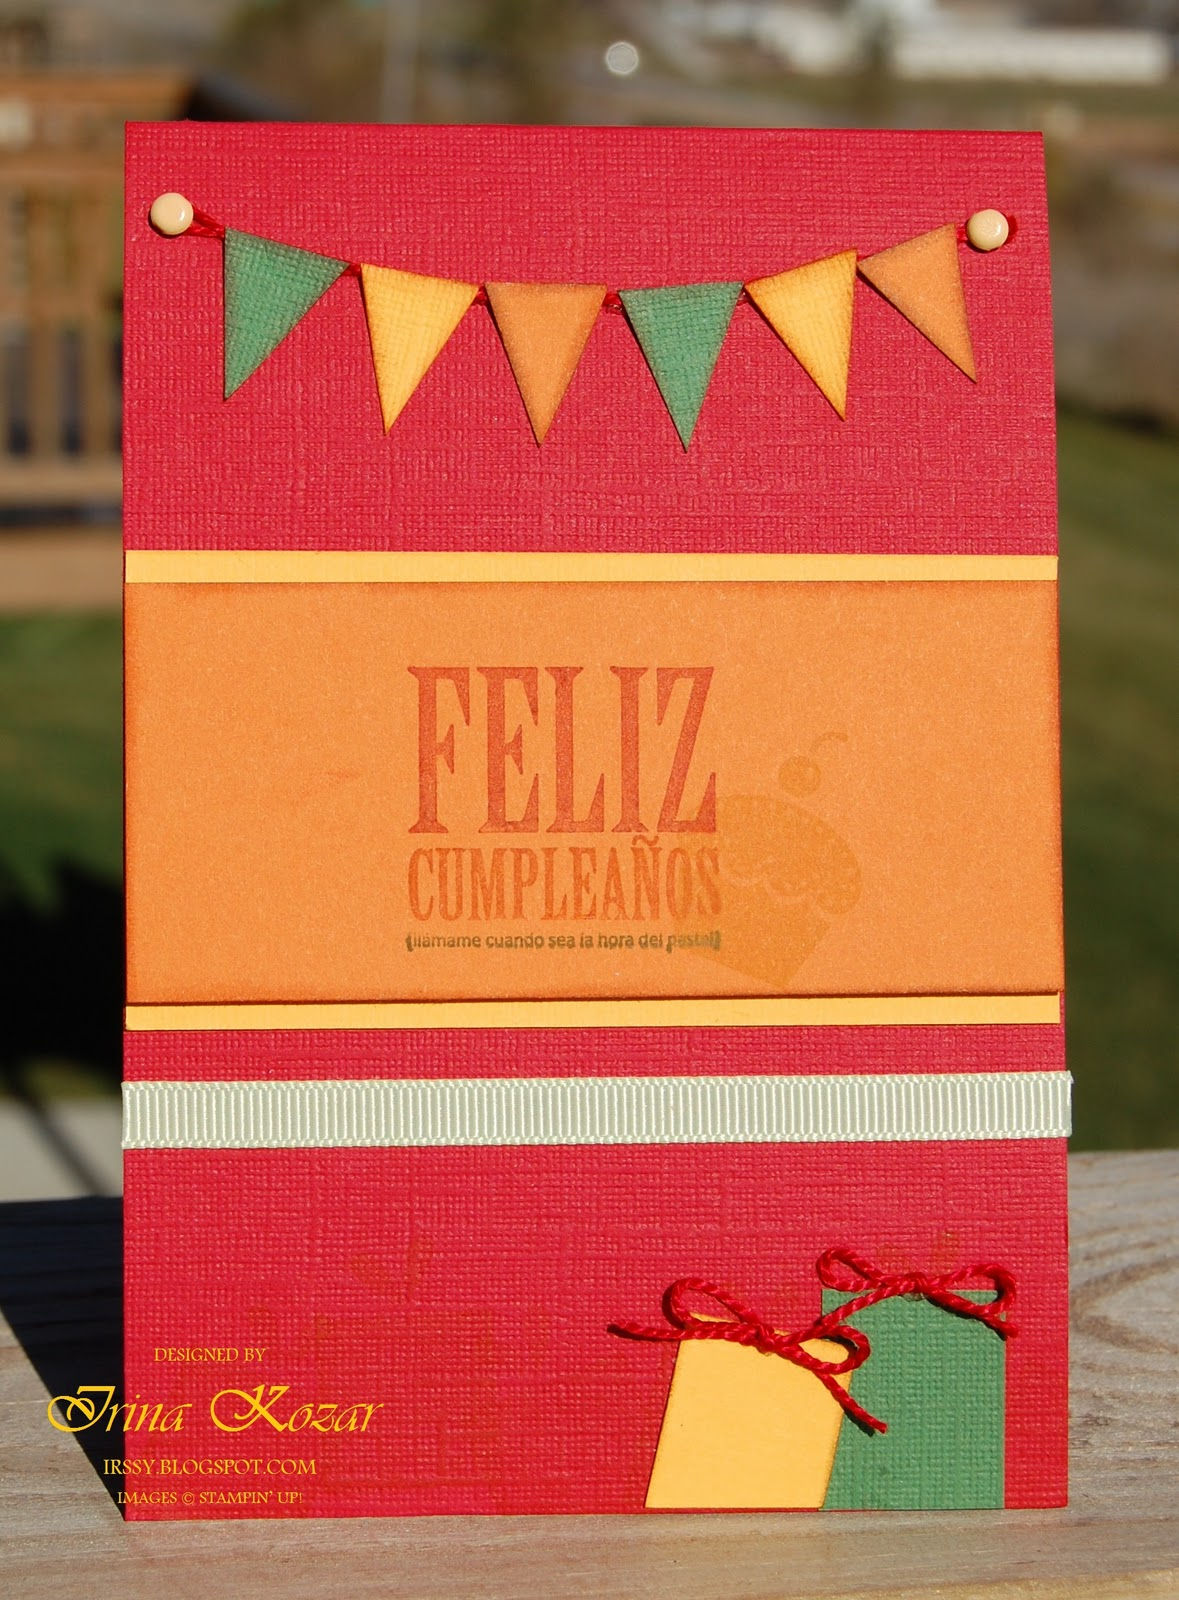 Happy balloons happy birthday cards happy b day happy birthday to you birthday birthday wishes greetings happy birthday banners feliz birthday stickers. Stampin' with Irina: Feliz Cumpleaños Card